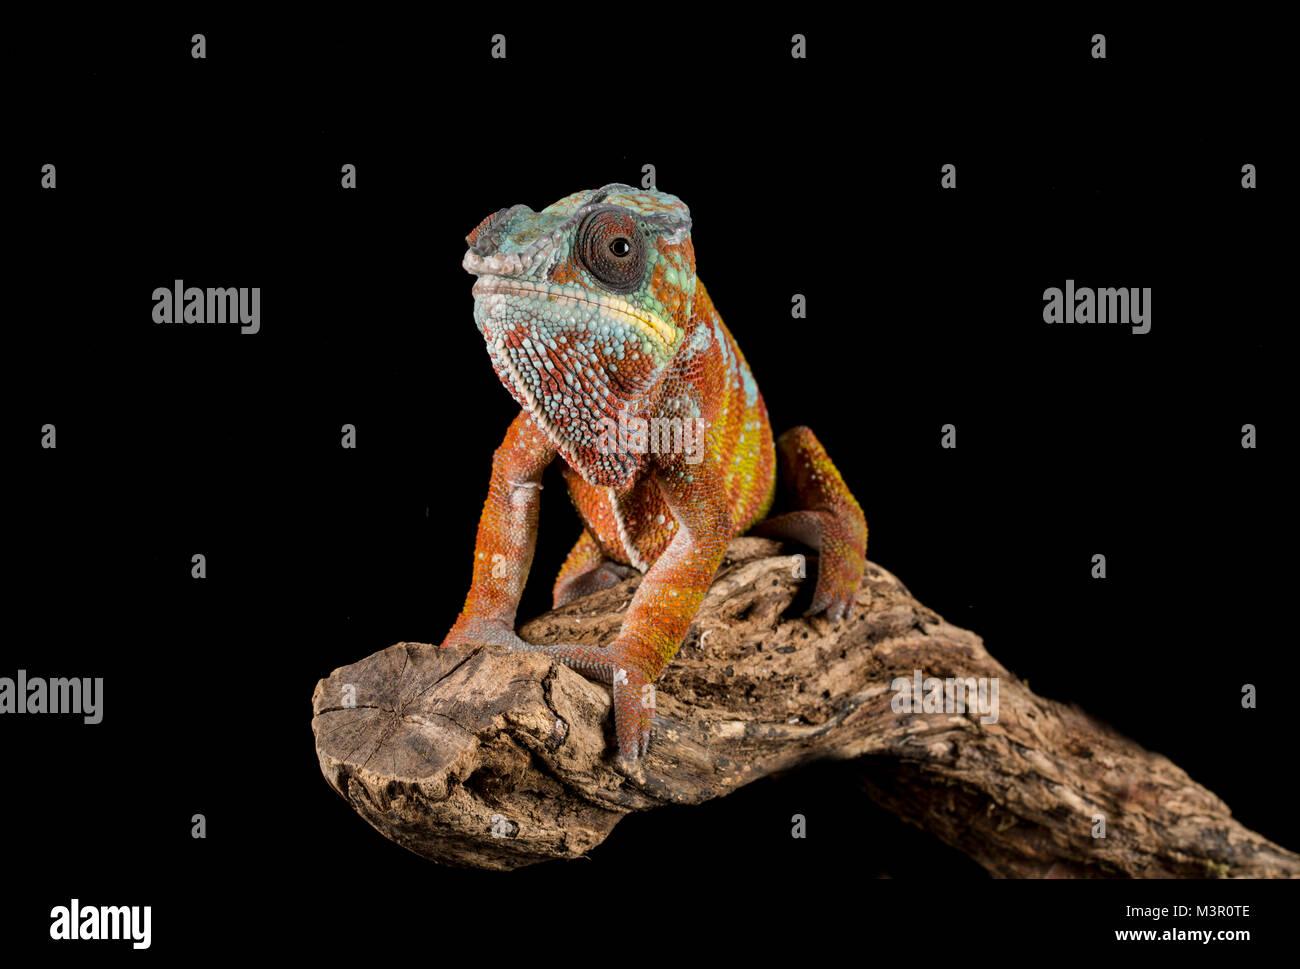 Studio background Chameleon on a branch - Stock Image